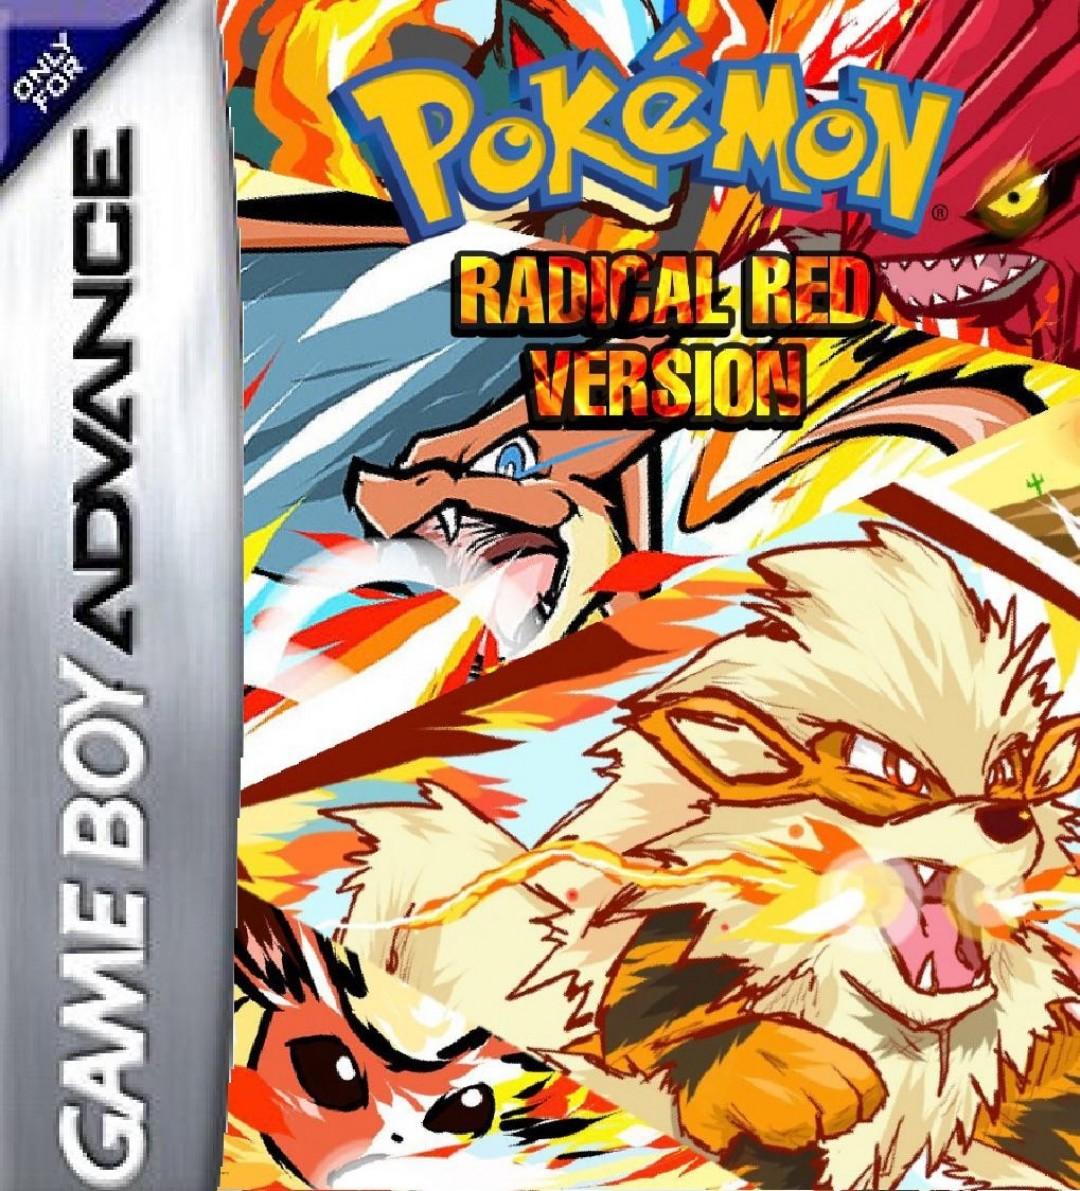 Pokémon RadicalRed Version